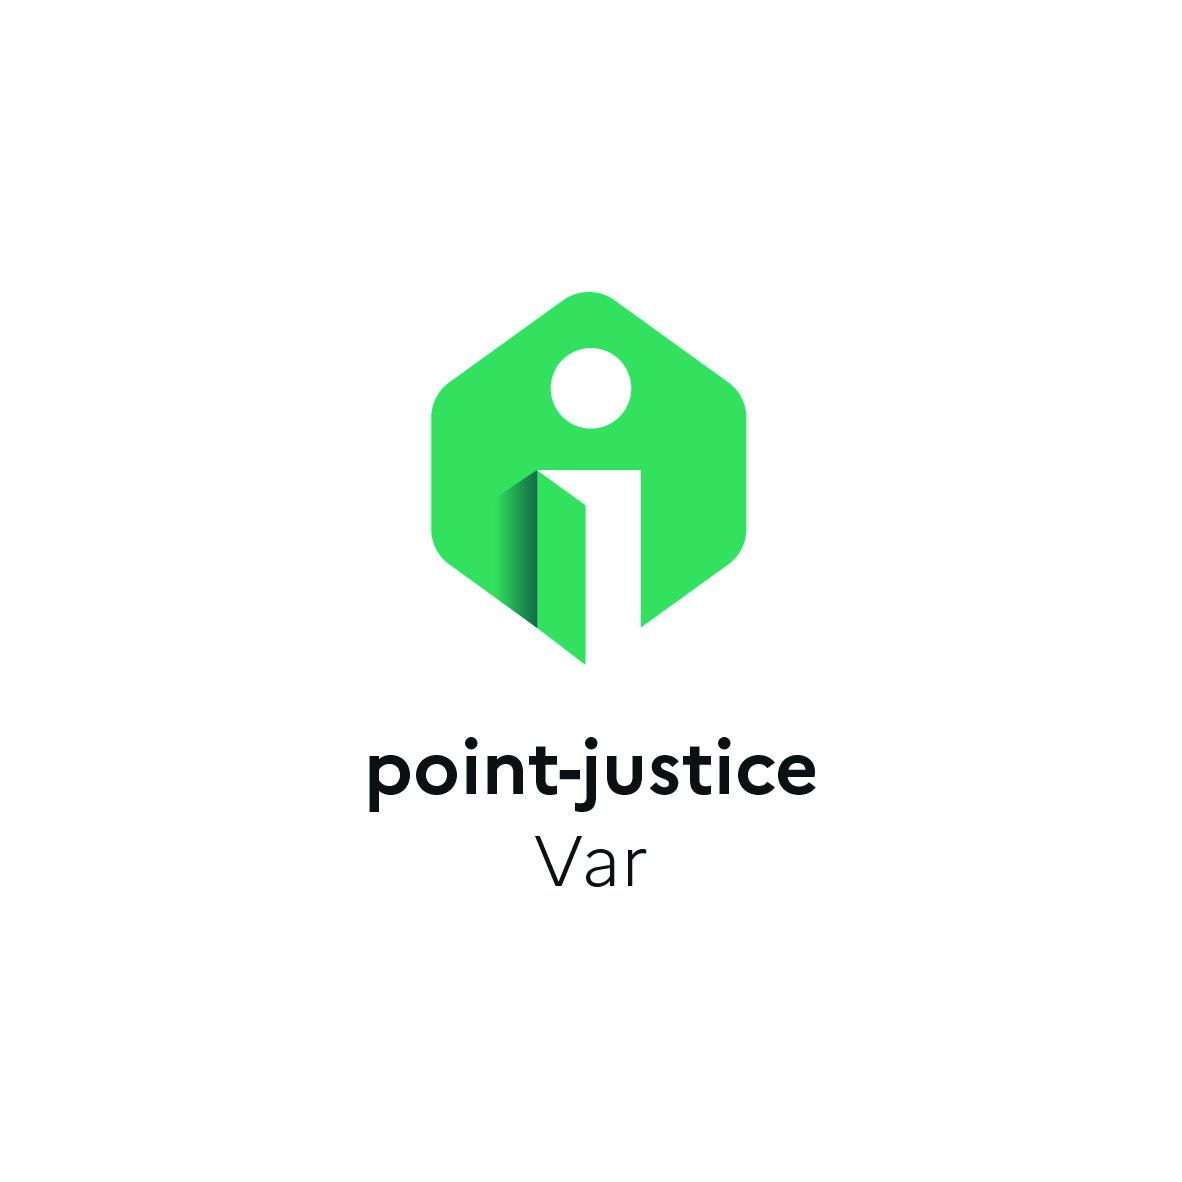 83_Var_logotypes-05